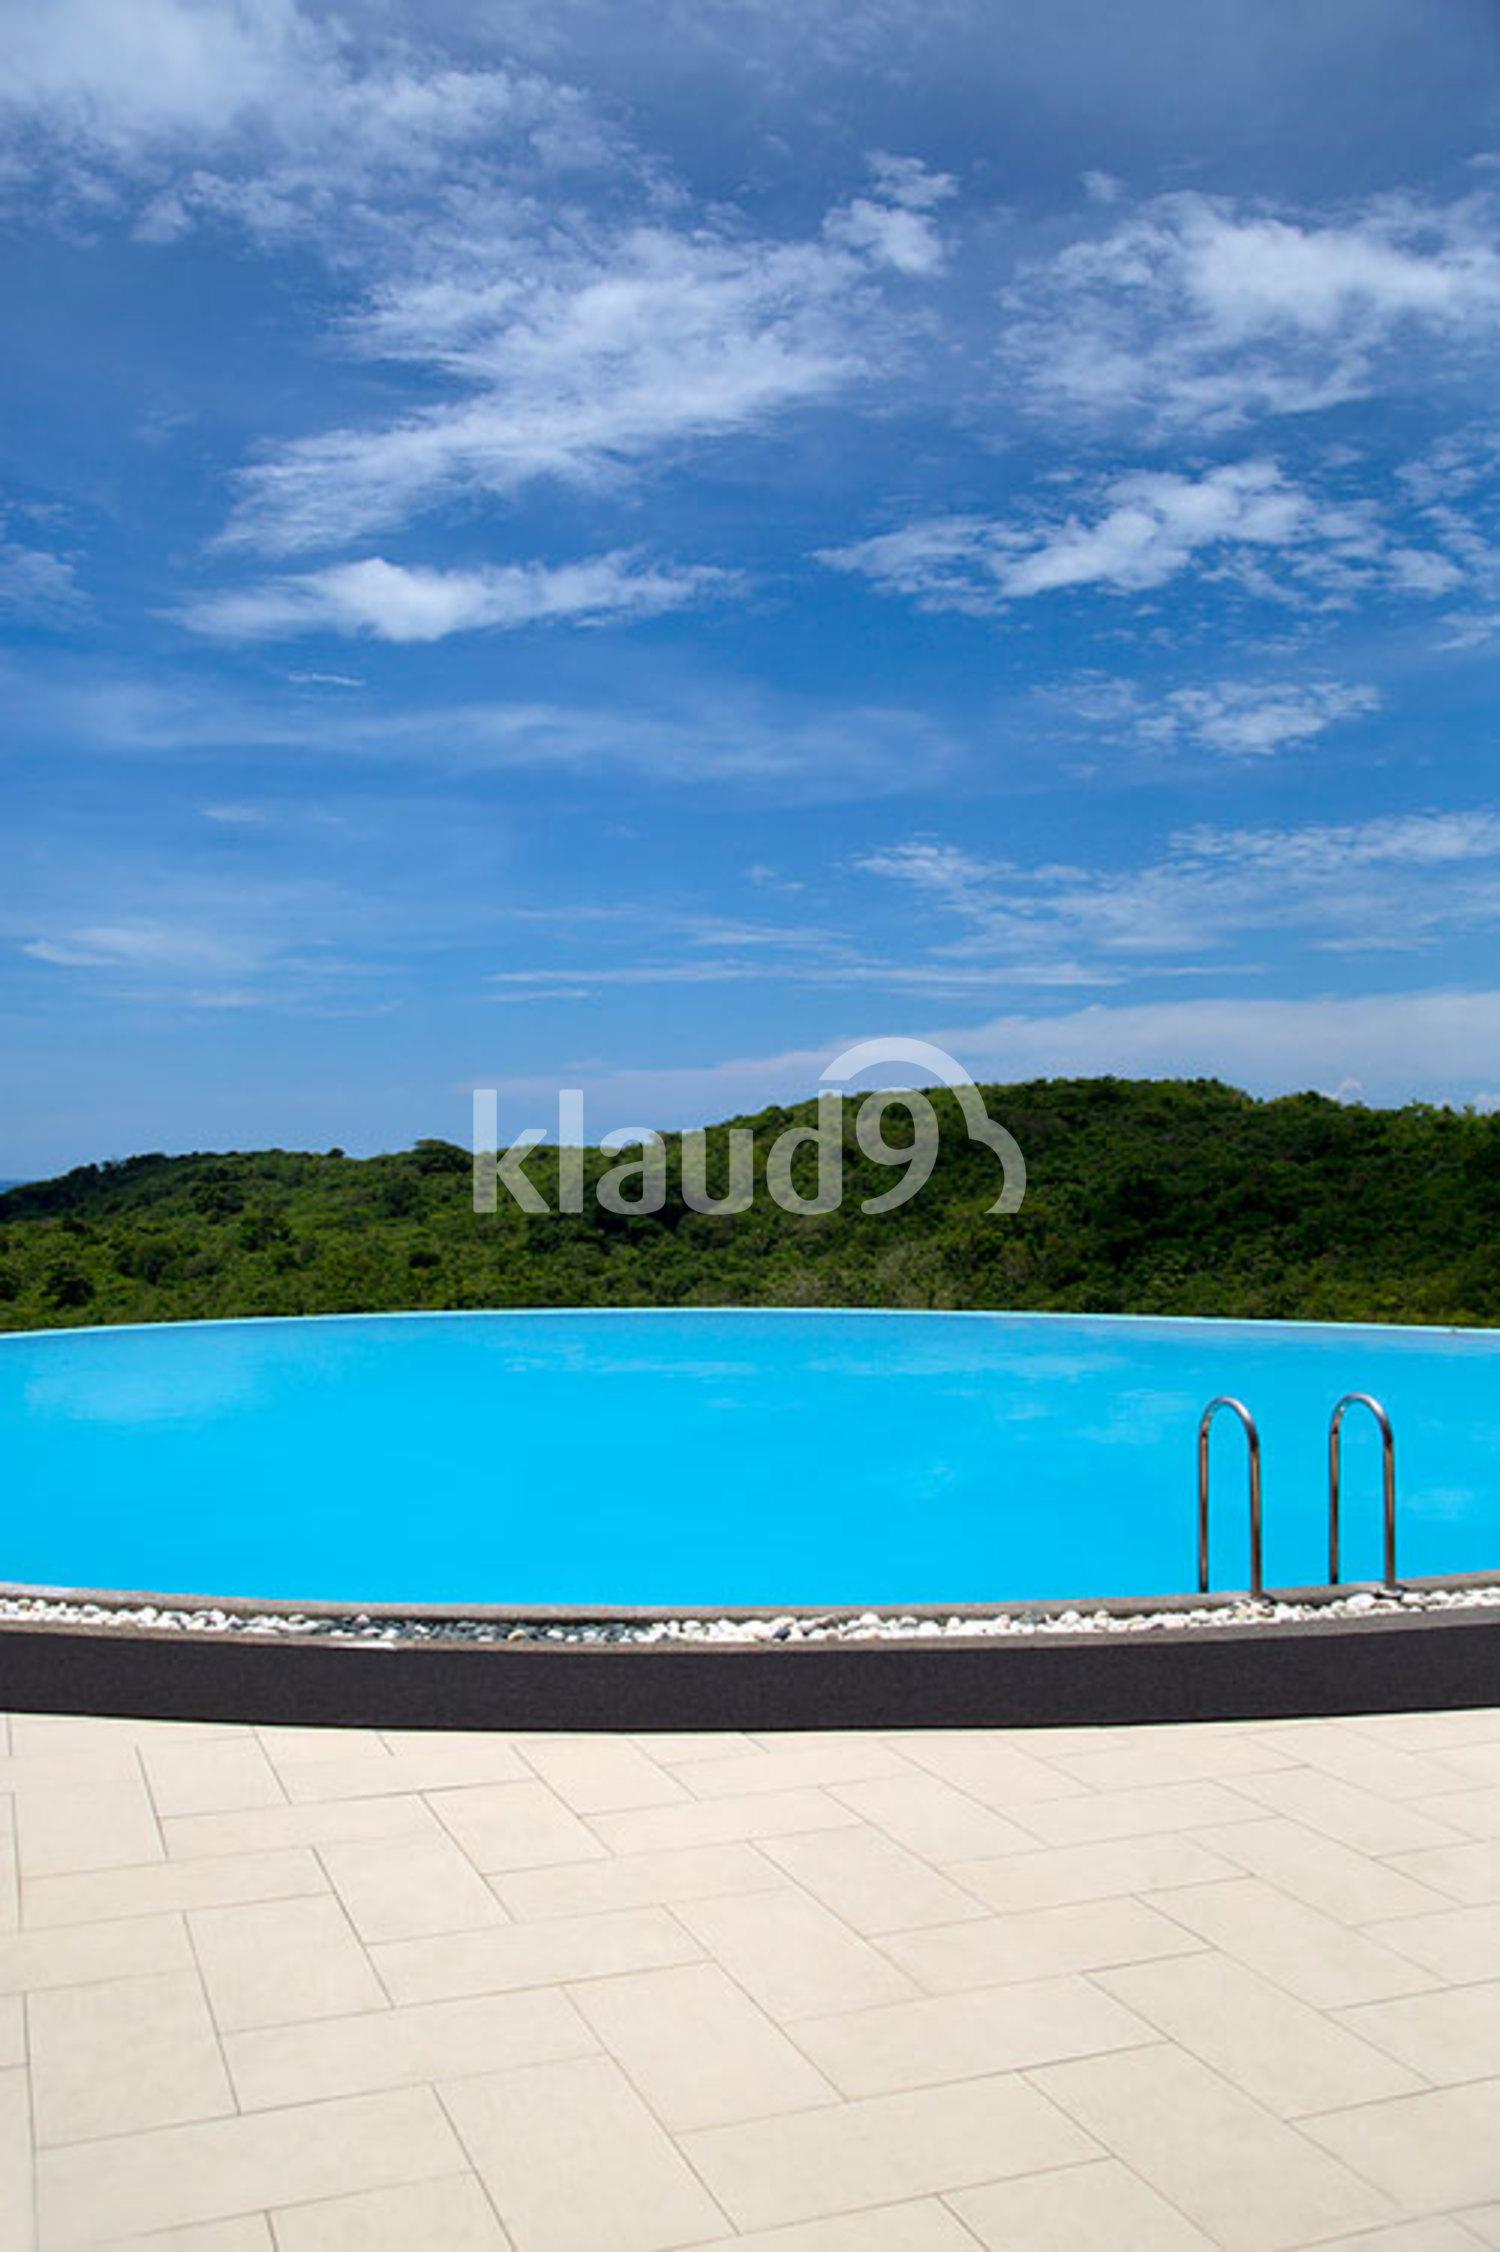 Swimming pool at luxury tropical resort